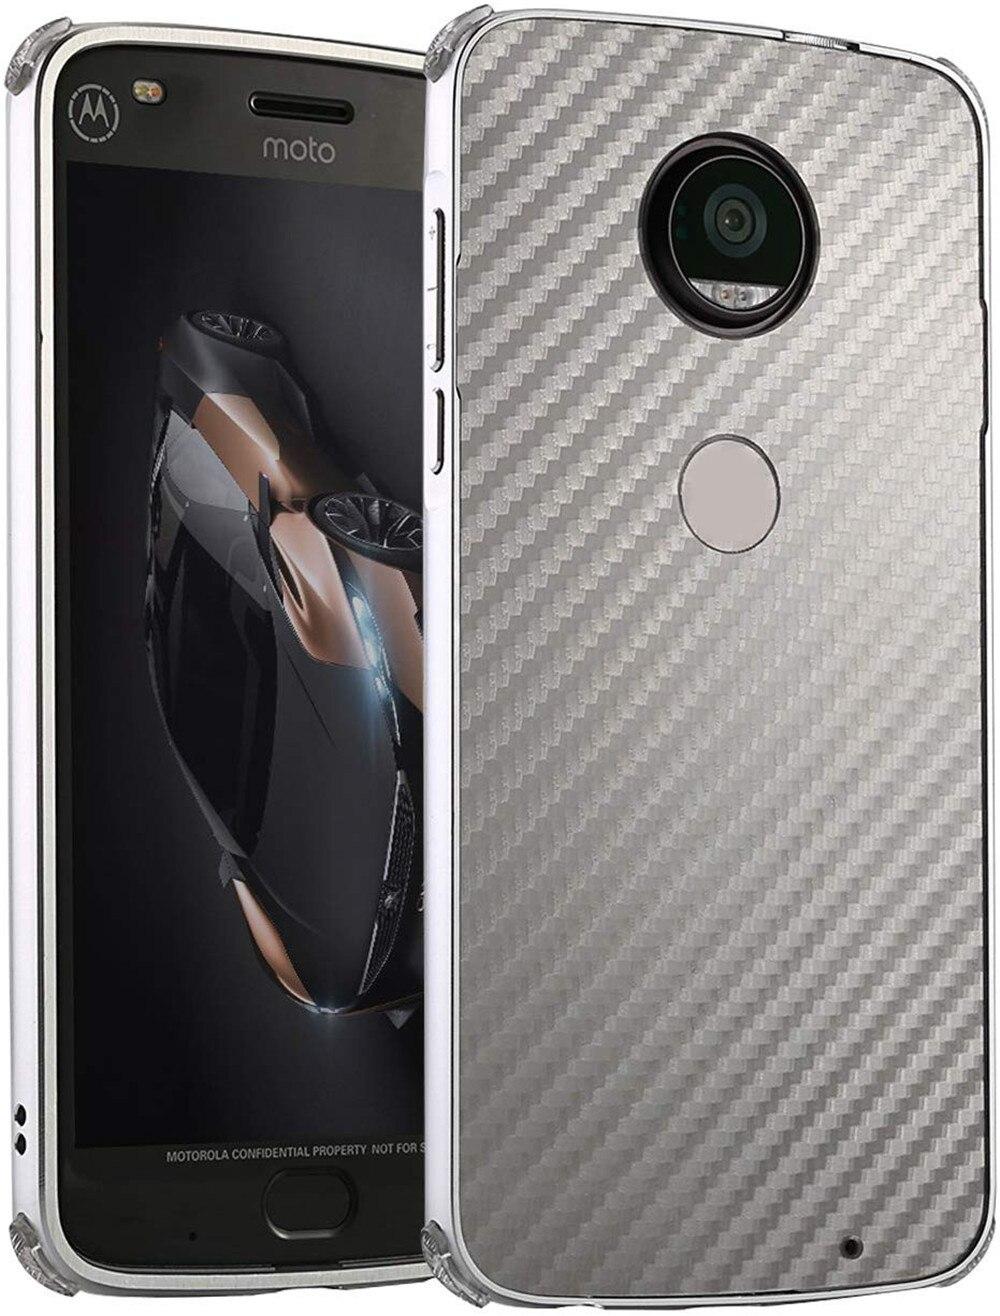 Aluminum Metal Bumper For Moto G5 G5s G6 G6 Plus Z2 Z3 Play E5 Play Case Carbon Fiber Pattern Plastic Back Silicone Edge Case